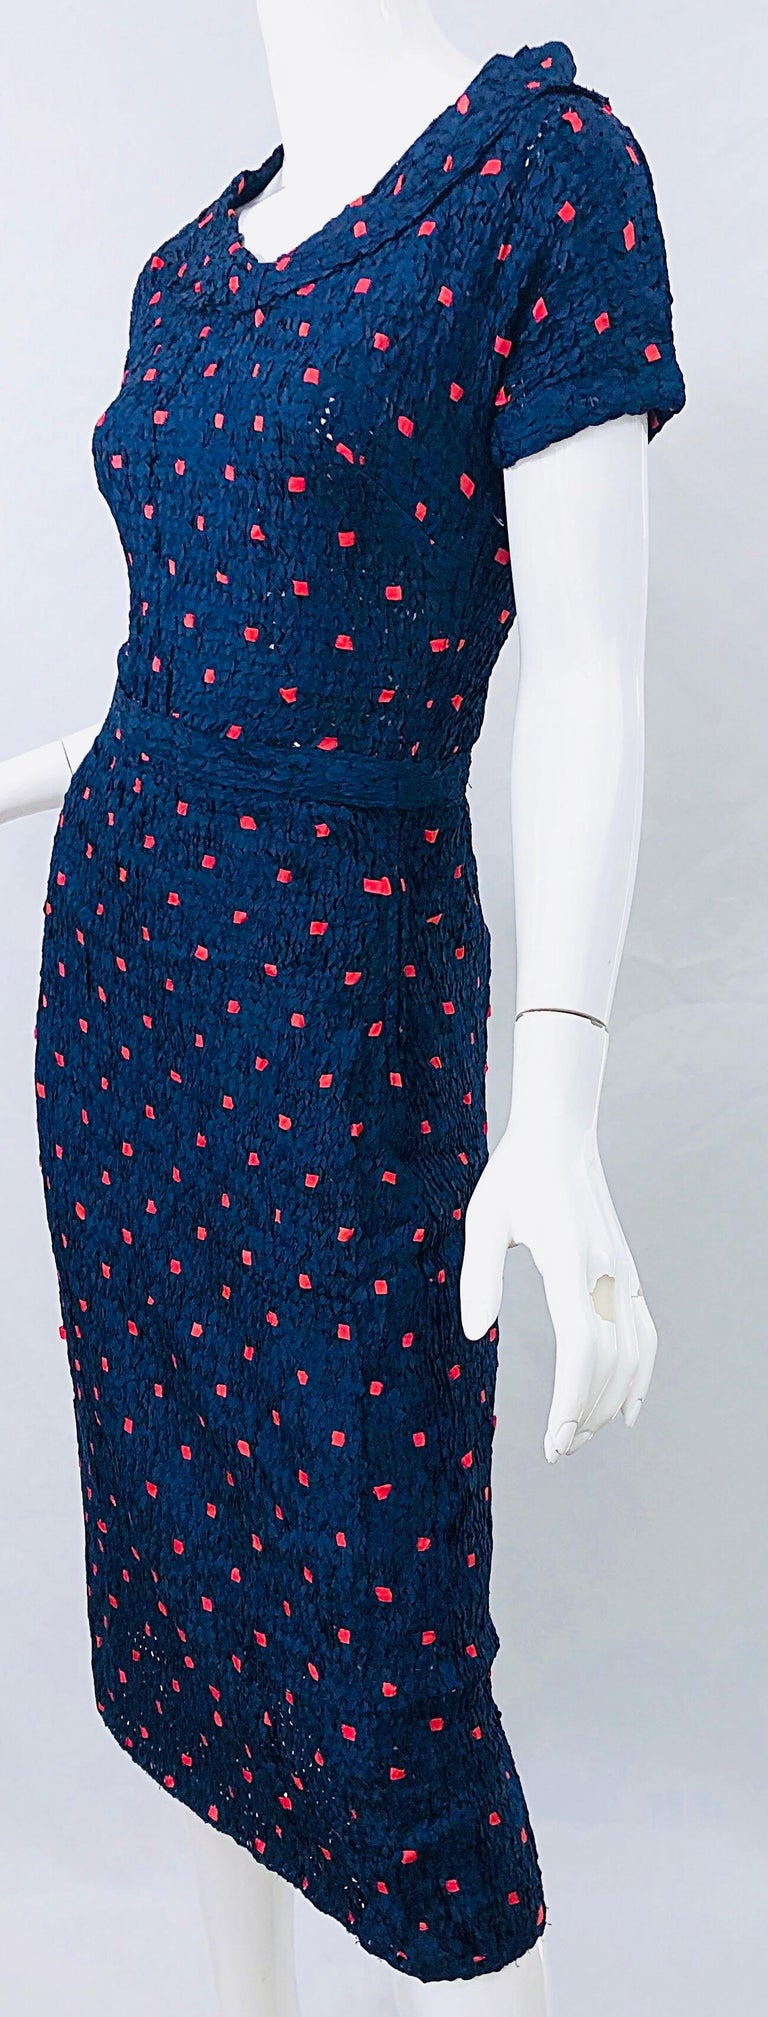 1950s Ann Fleischer for I Magnin Hand Ribbon Knit Navy Blue + Red Vintage Dress For Sale 7